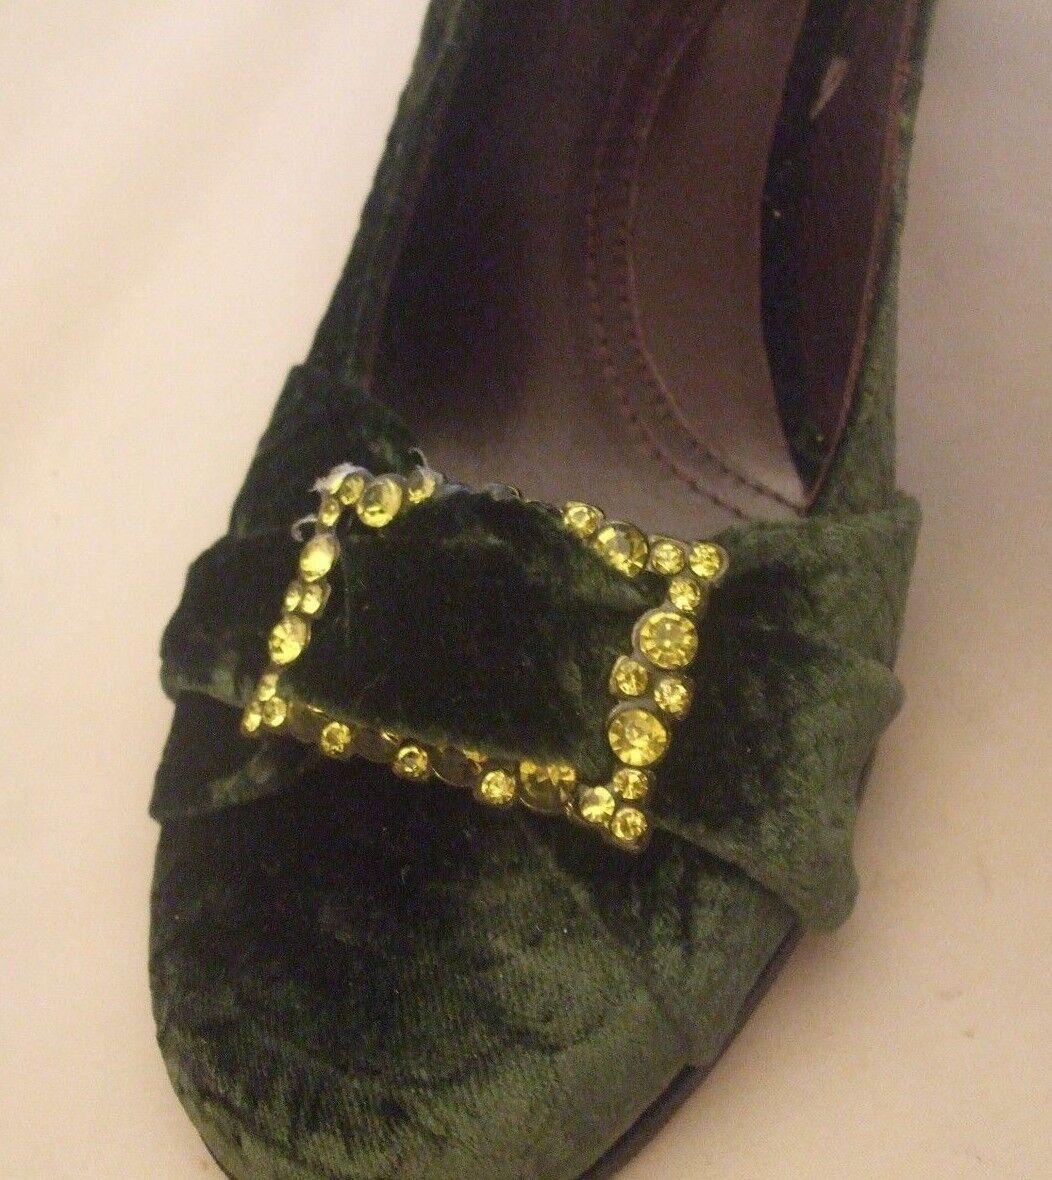 NEU Via Spiga Größe 7 Velvet Emerald Green Cloth w/Rhinestone Buckle 4